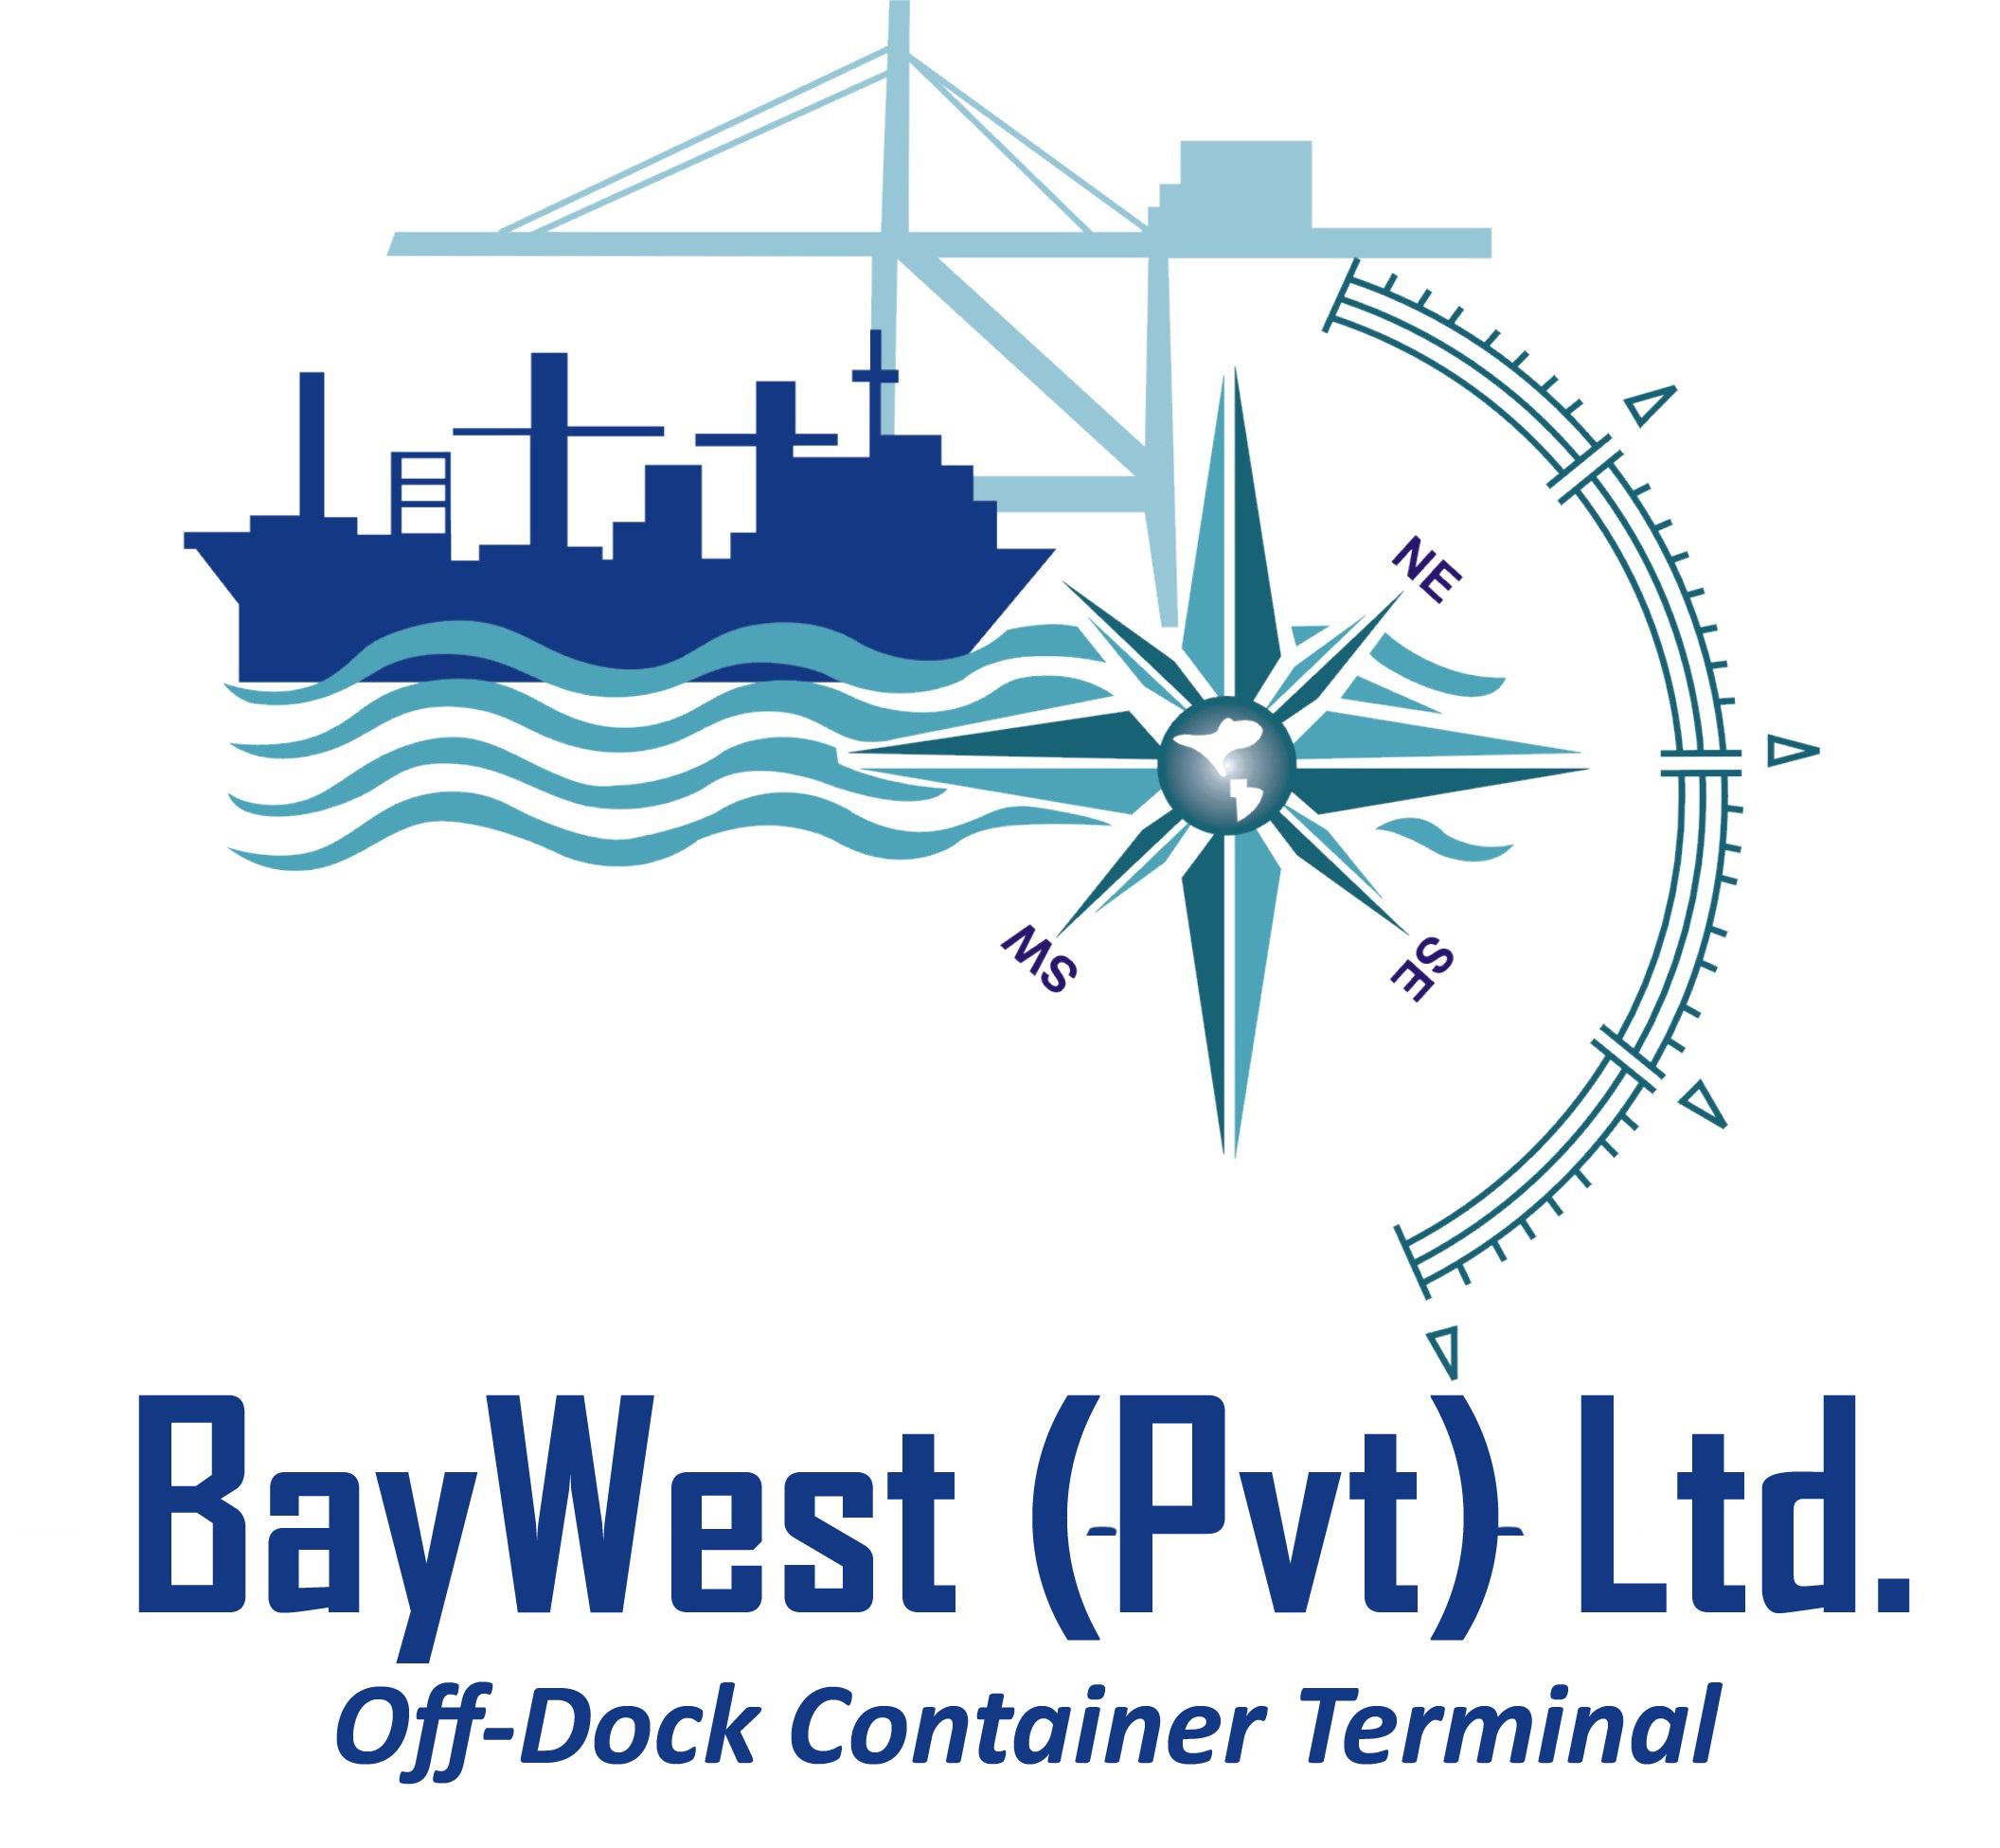 BayWest PVT Ltd